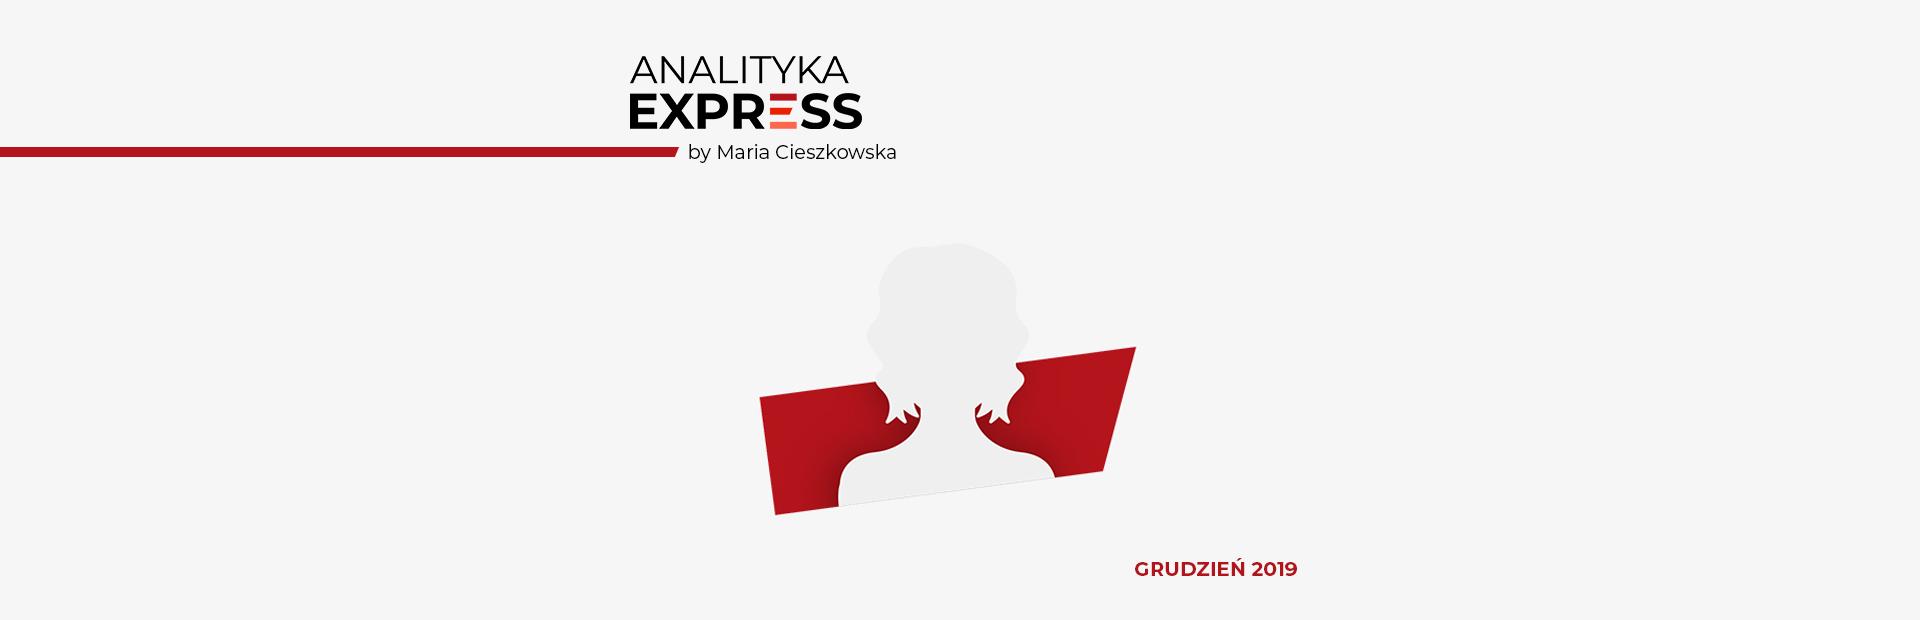 Analityka Express 12/2019